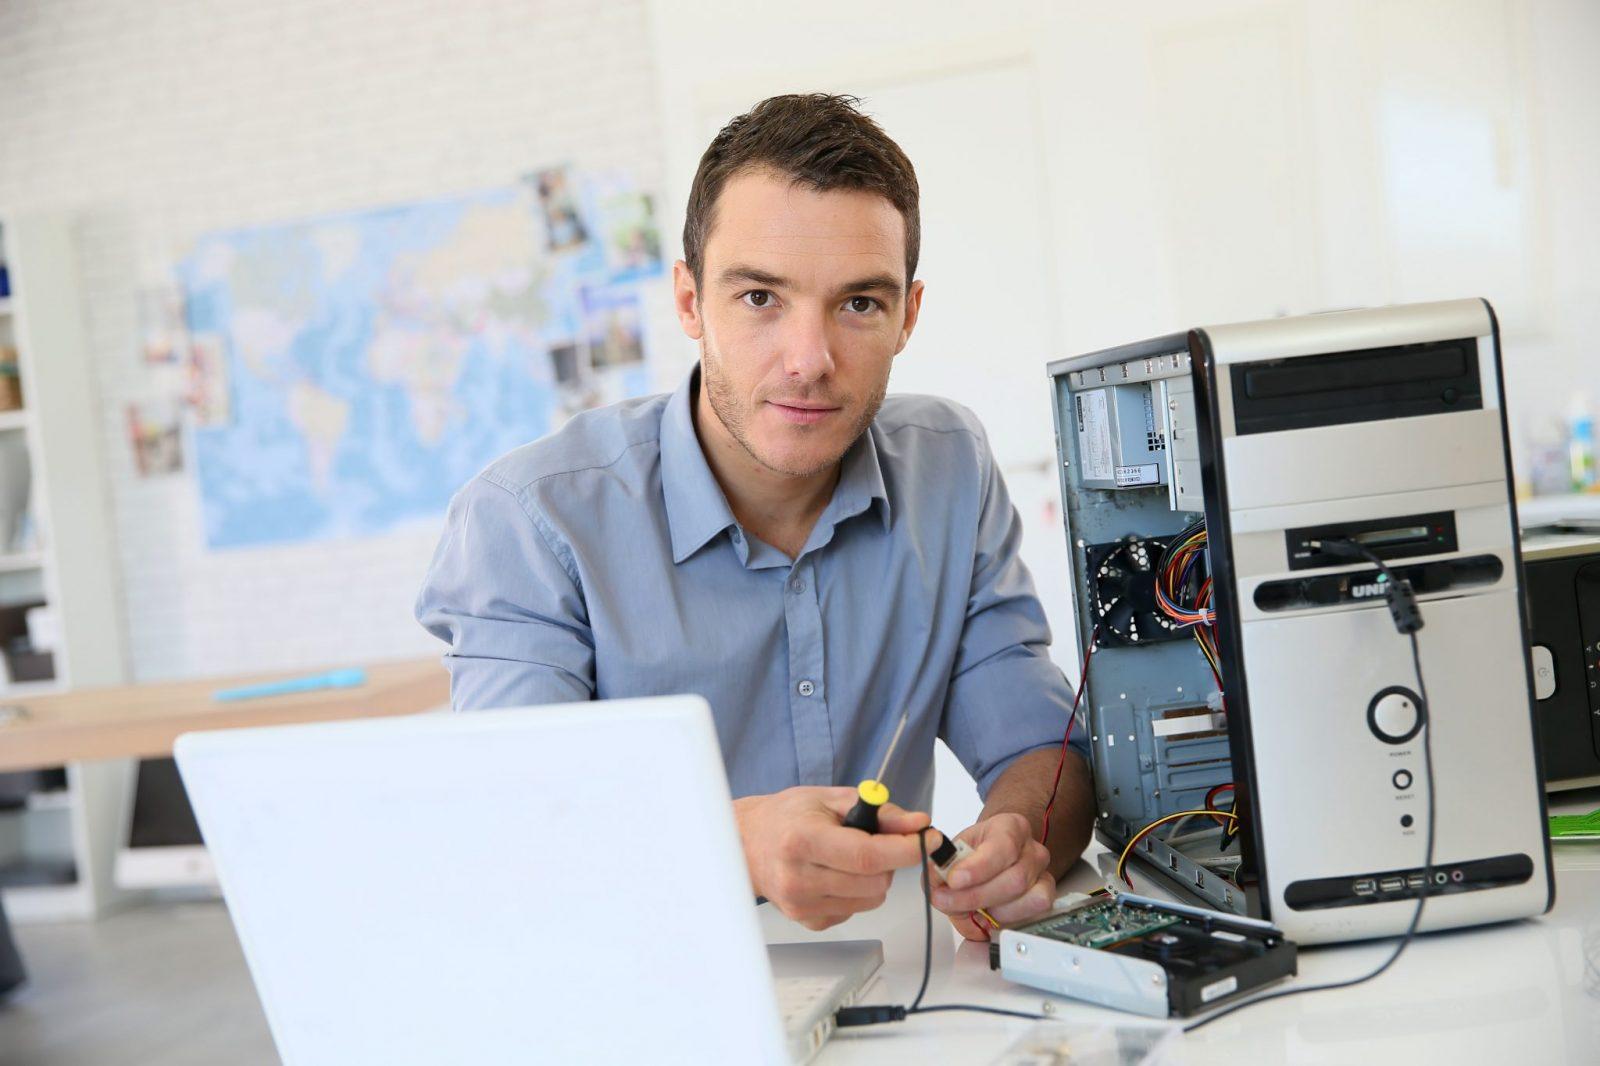 Man Sat with Desktop PC